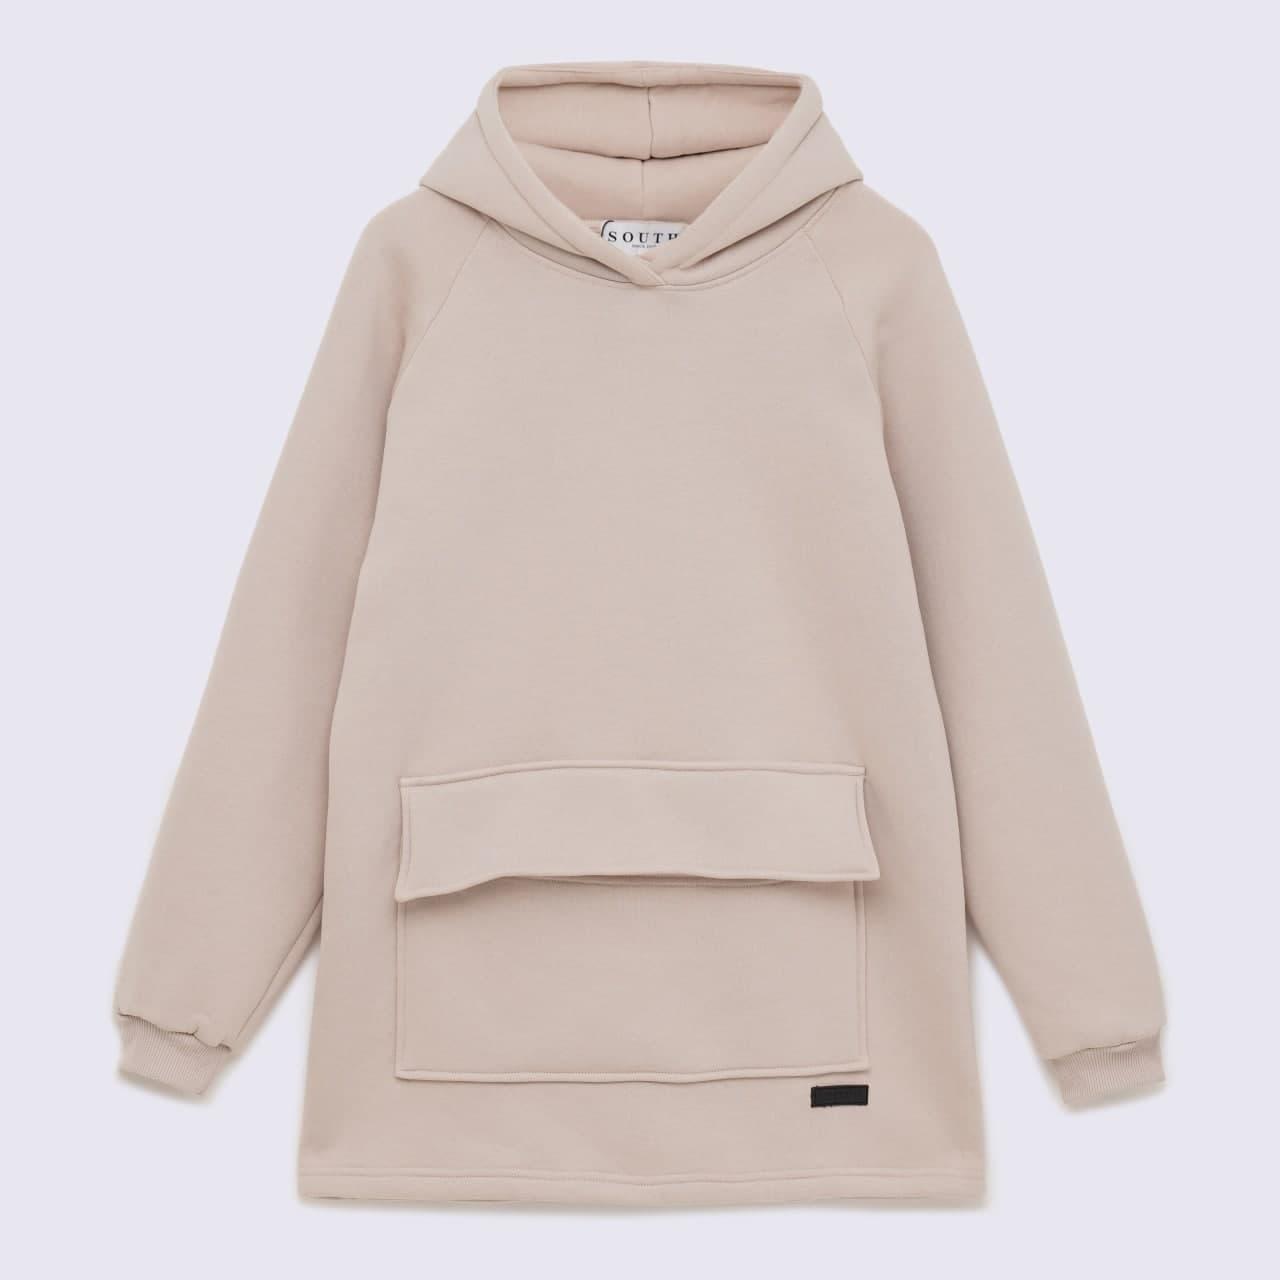 Худи South basic fleece beige oversize